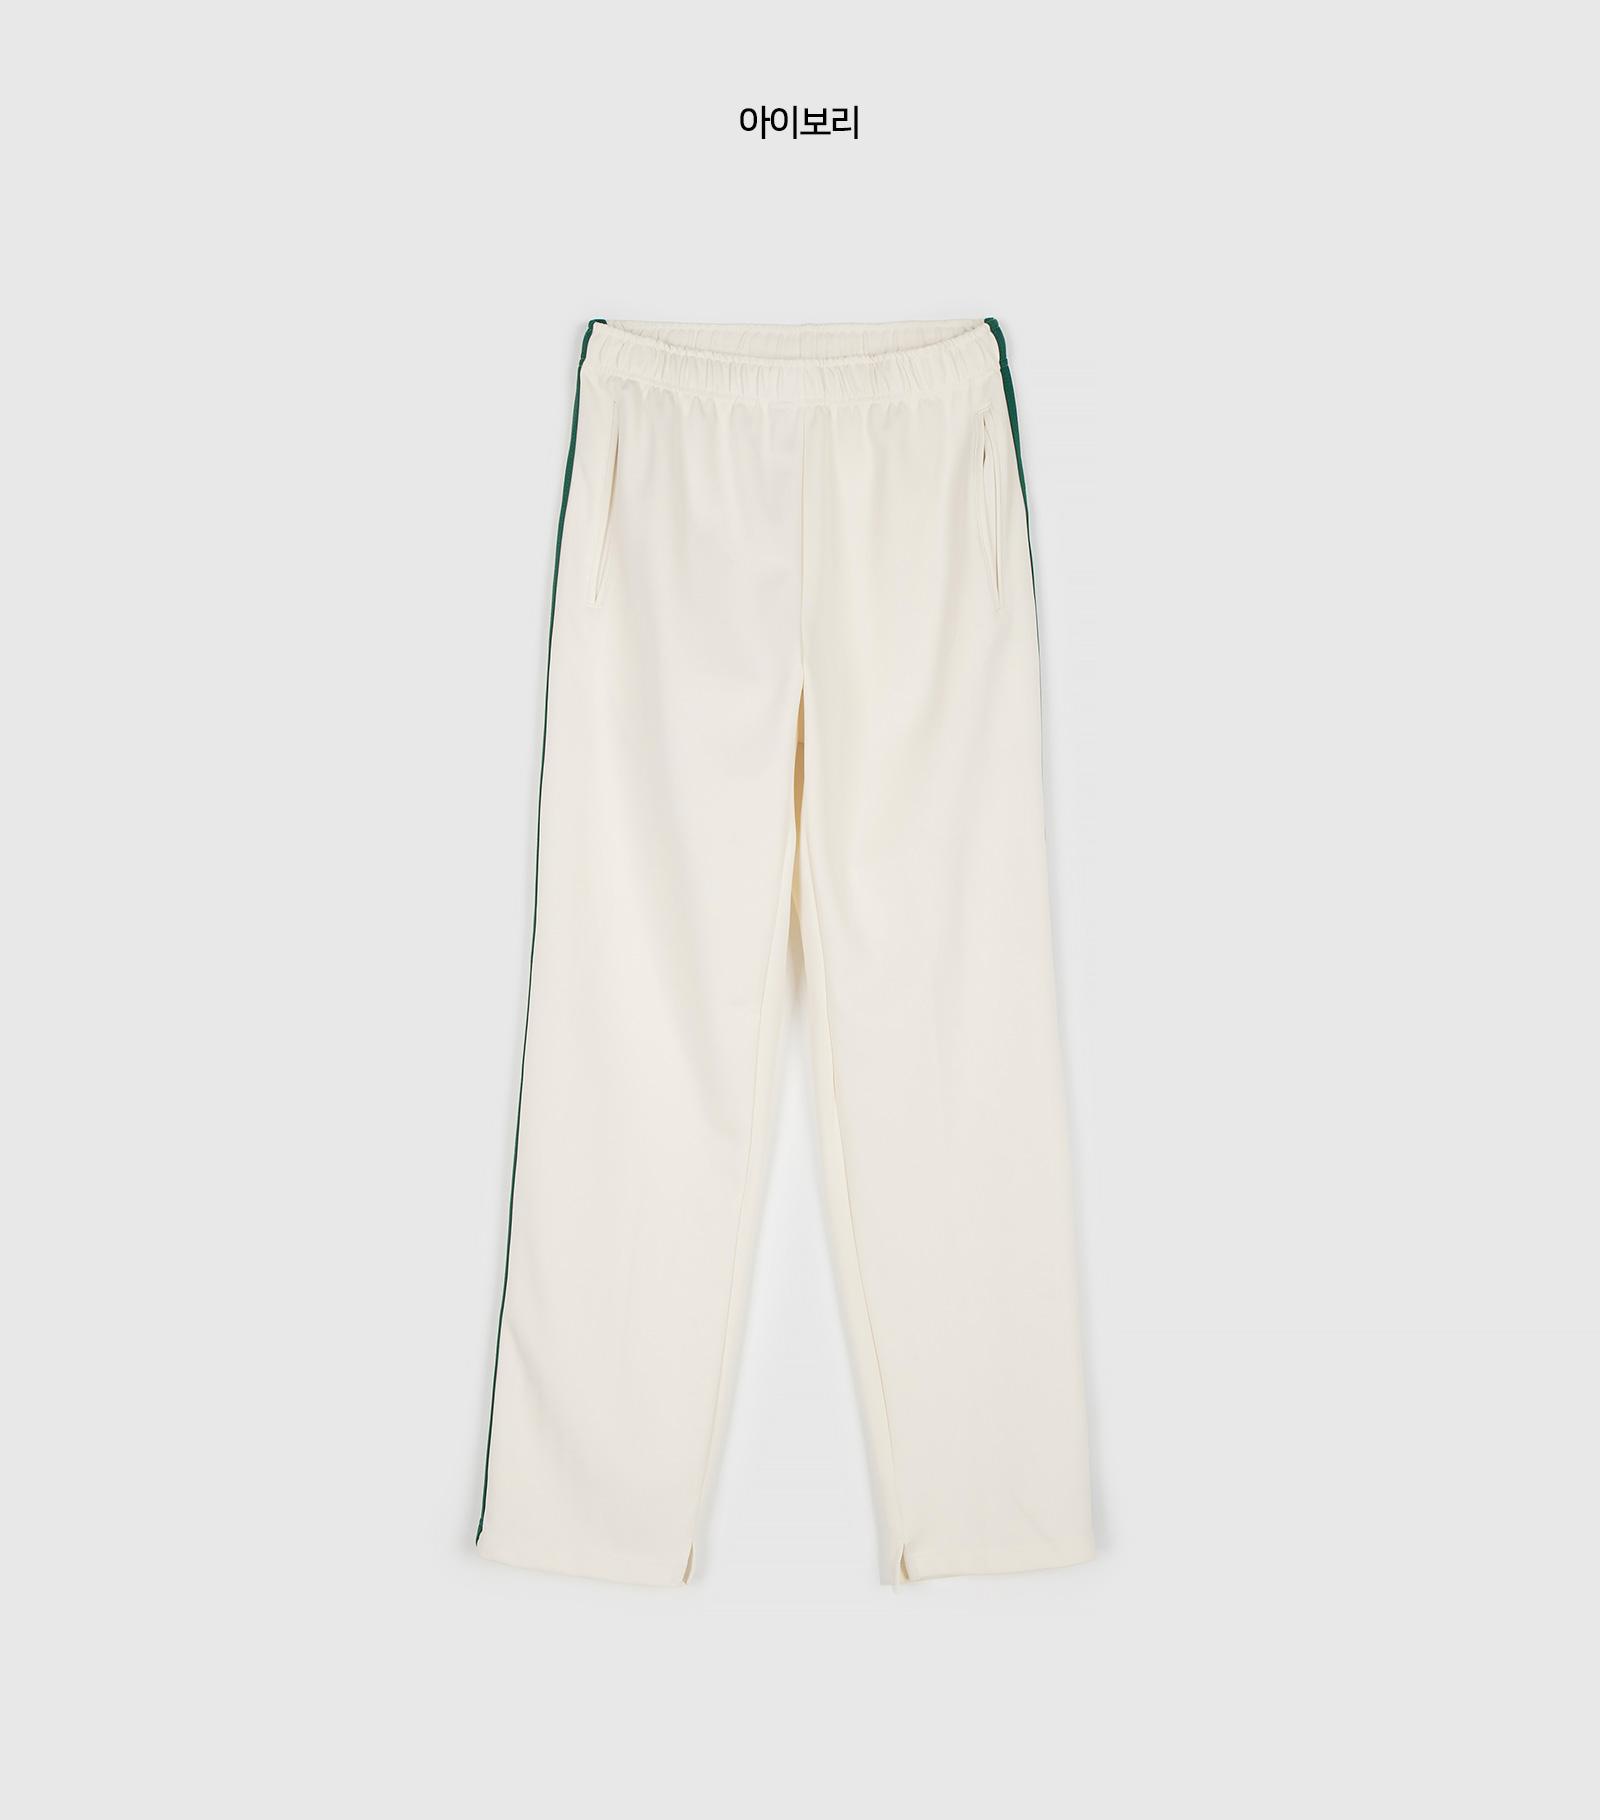 Two line banding training pants